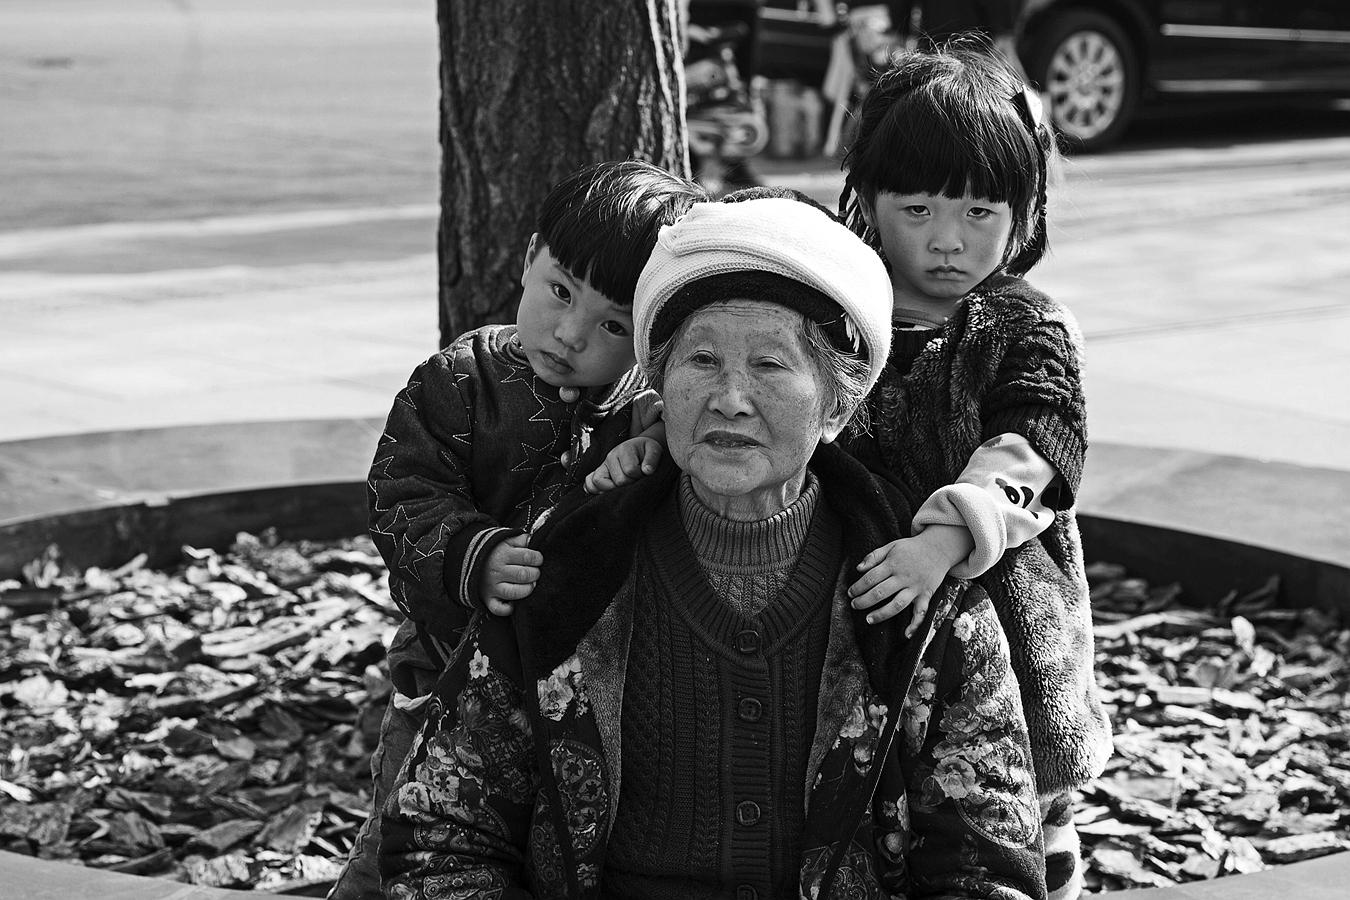 xisteven作品:老人与孩子